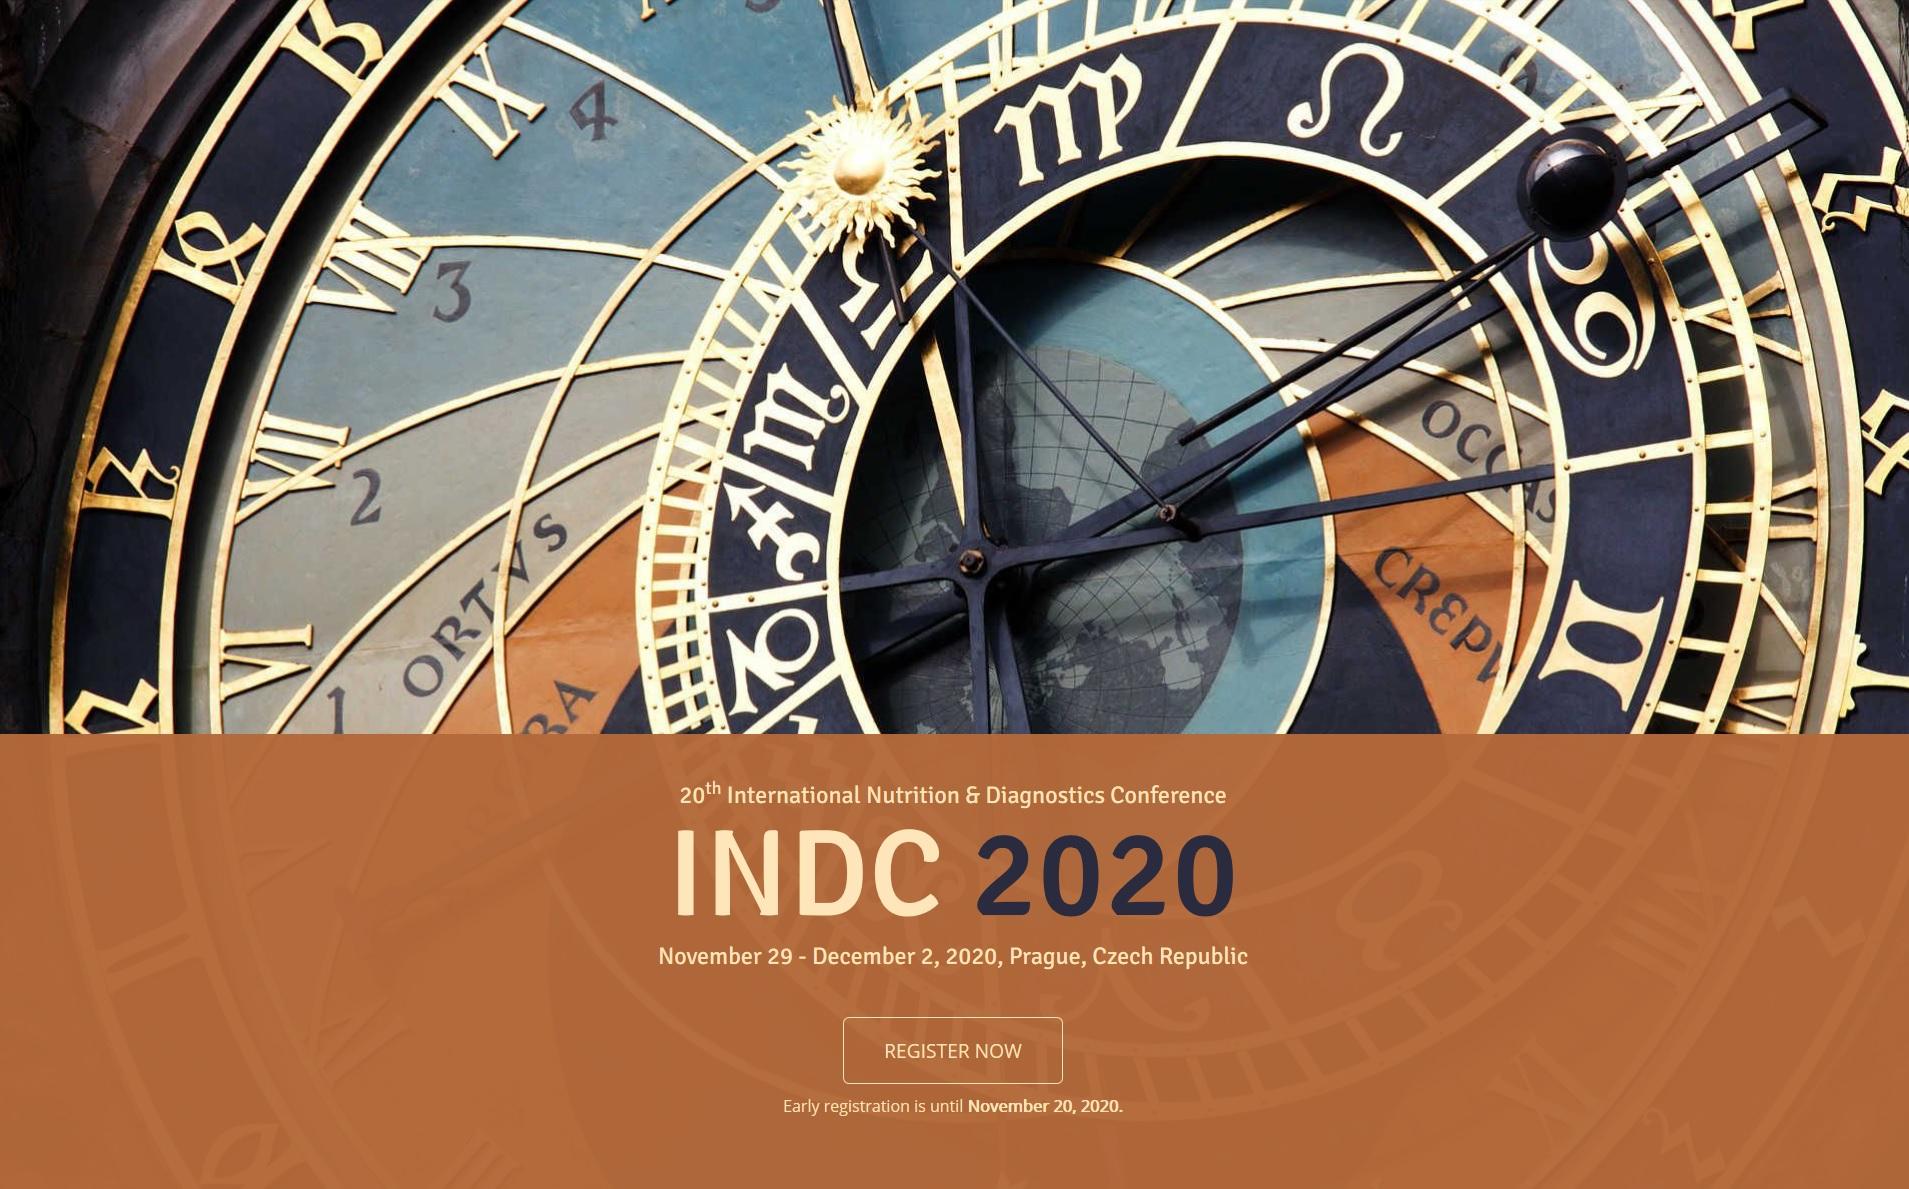 20th International Nutrition & Diagnostics Conference